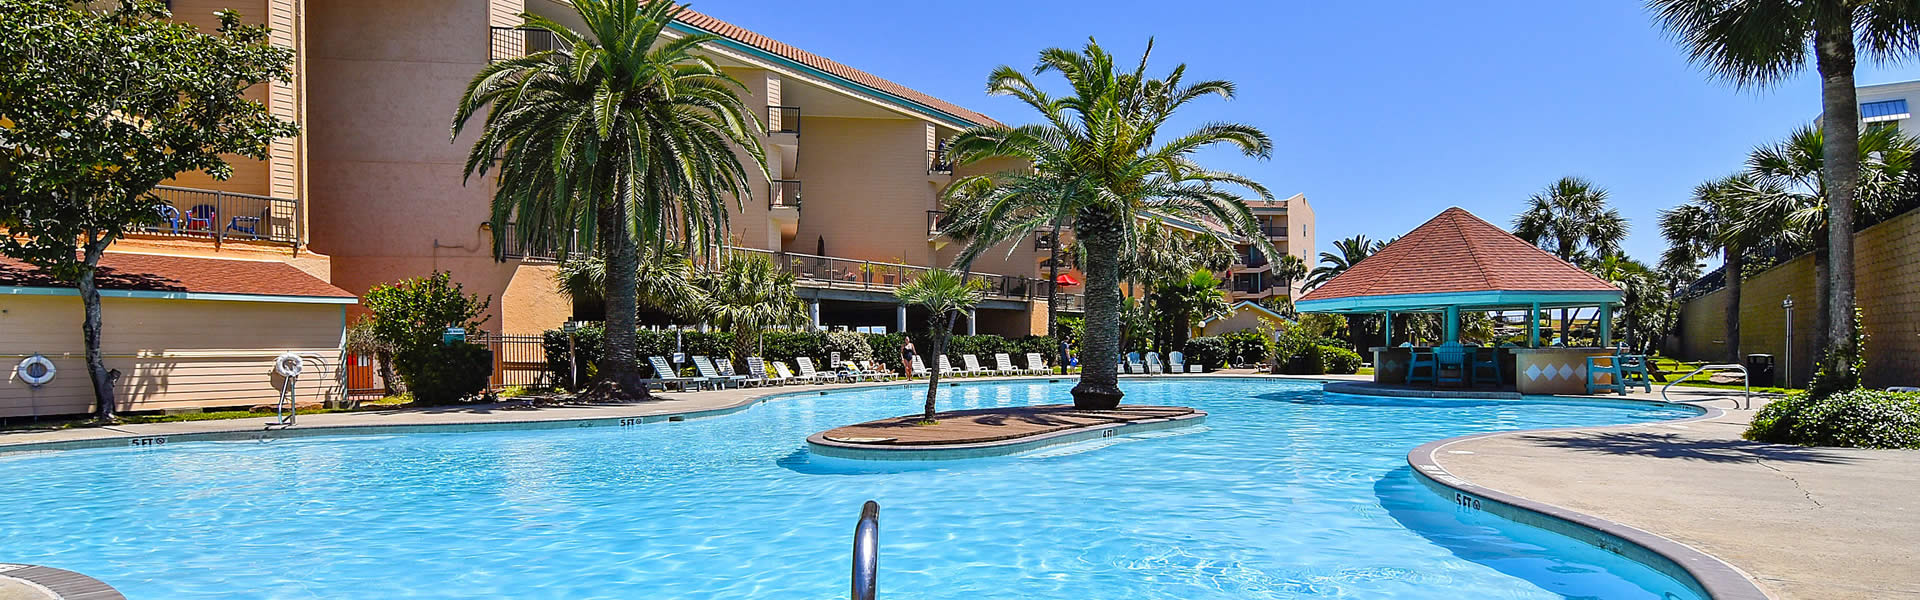 Maravilla Condos Resort Galveston